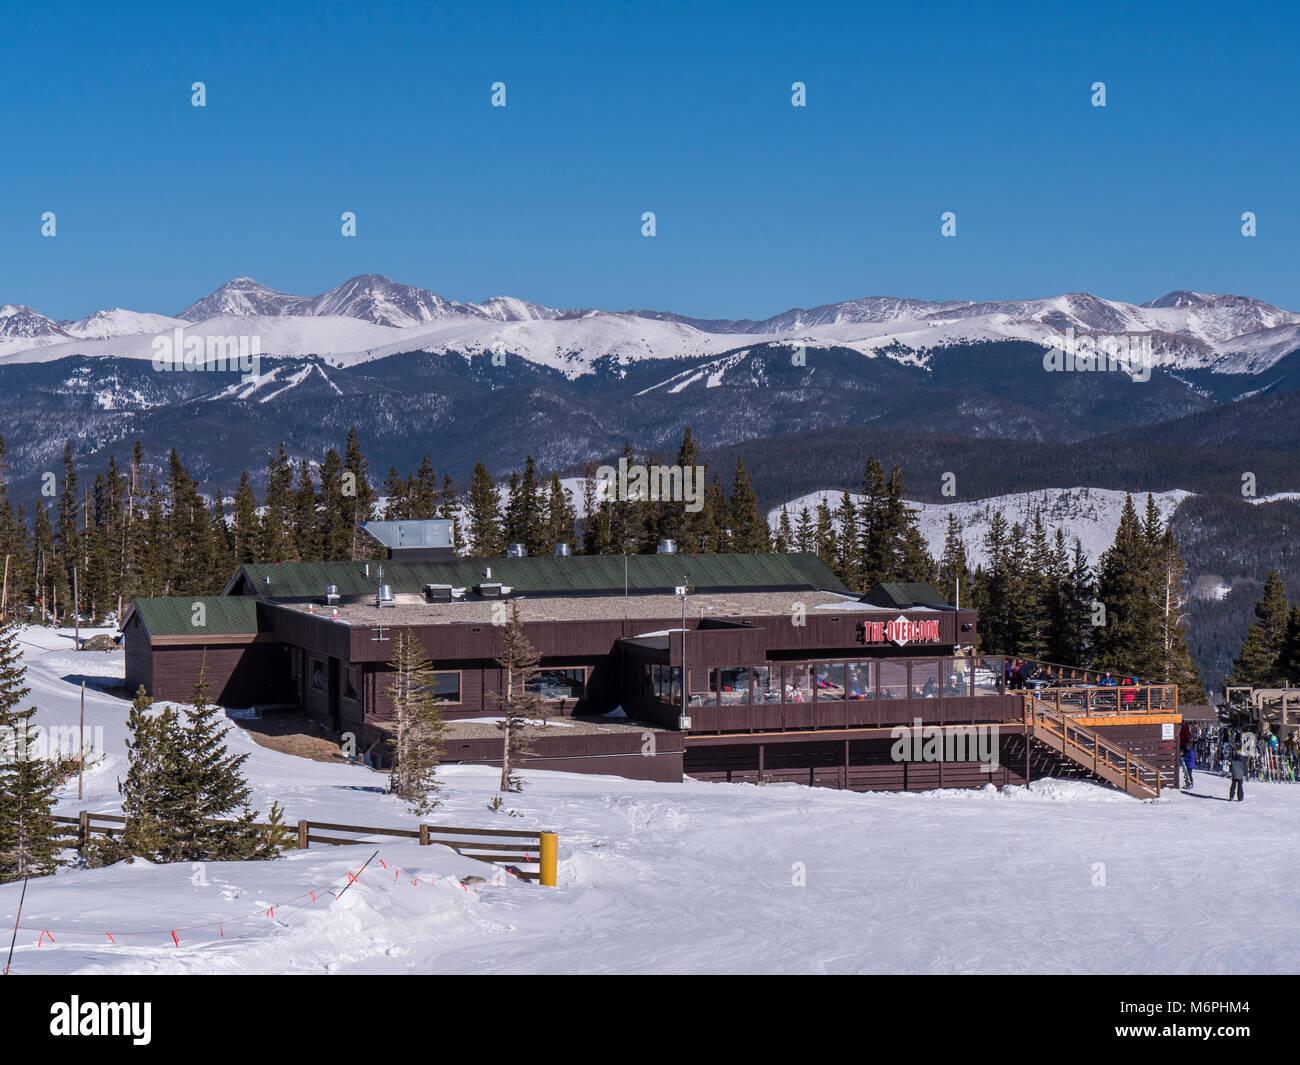 The Overlook day lodge and restaurant atop Peak 9, Breckenridge Ski Resort, Breckenridge, Colorado. - Stock Image